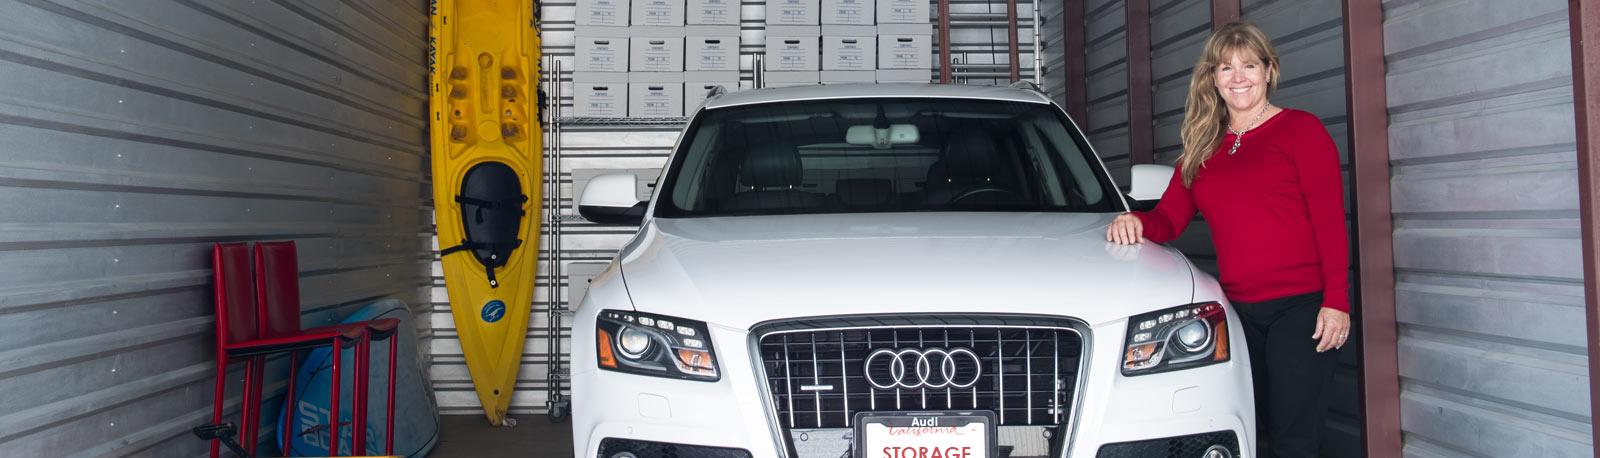 Storage-Hero-Image-Car-in-Storage-Unit